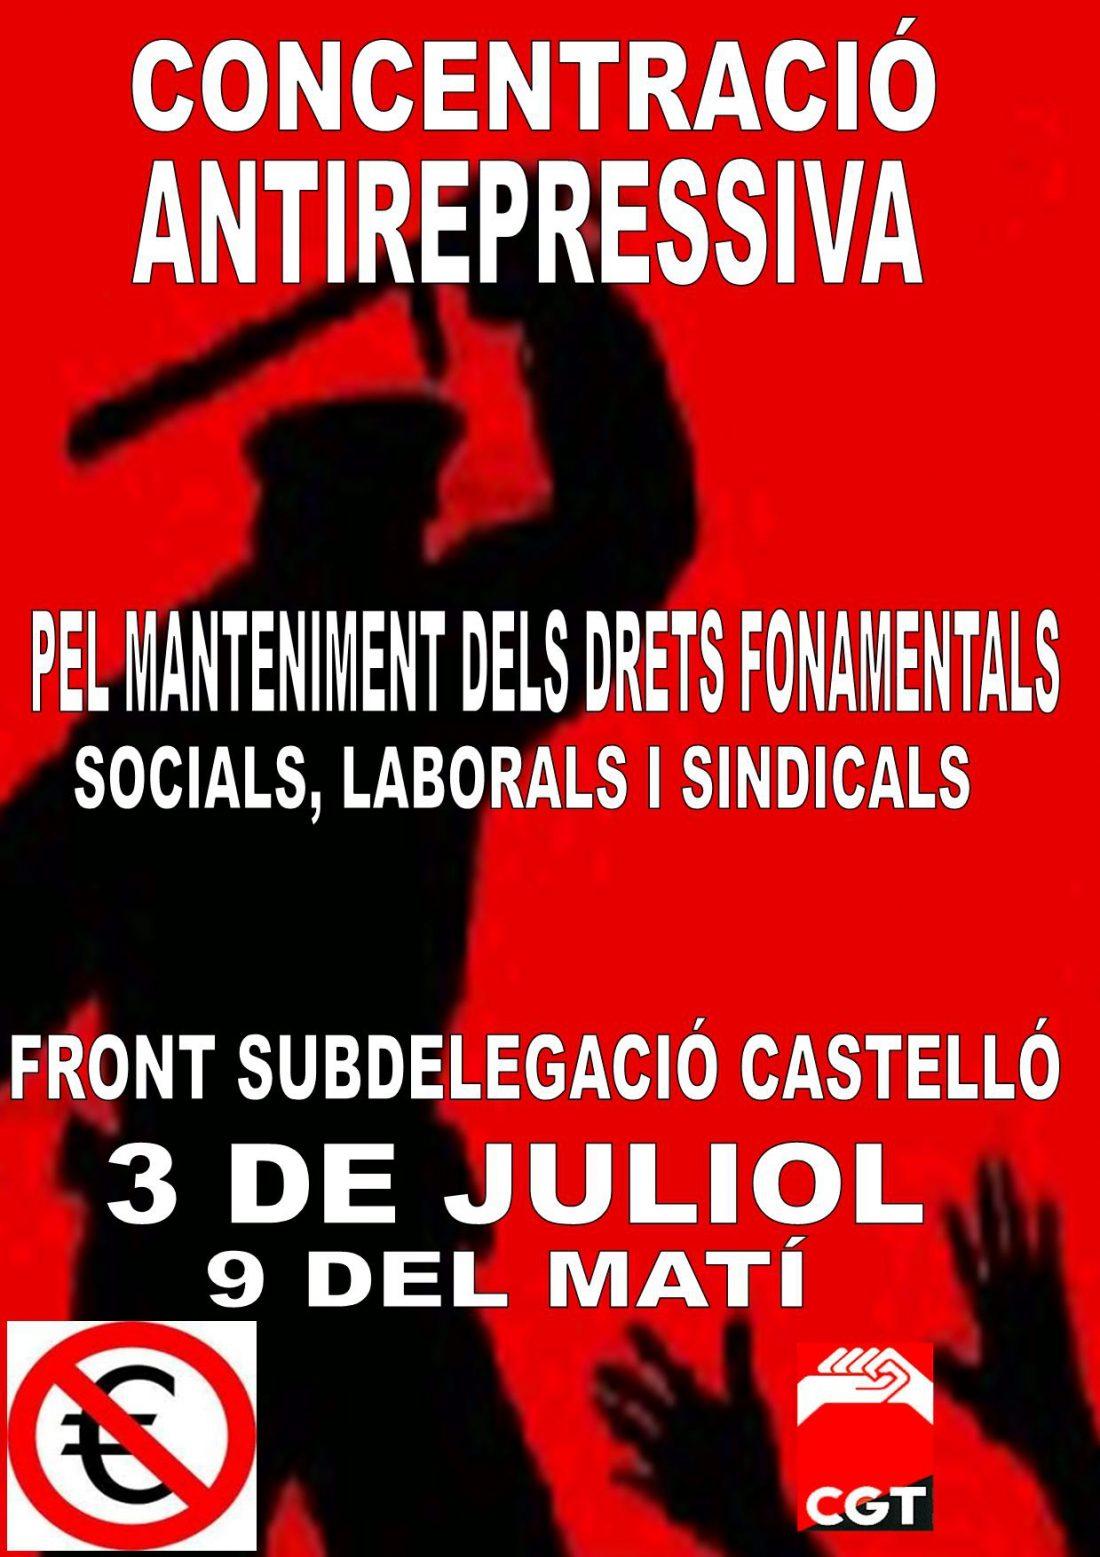 Castellón. 3 de julio Jornada Antirrepresiva